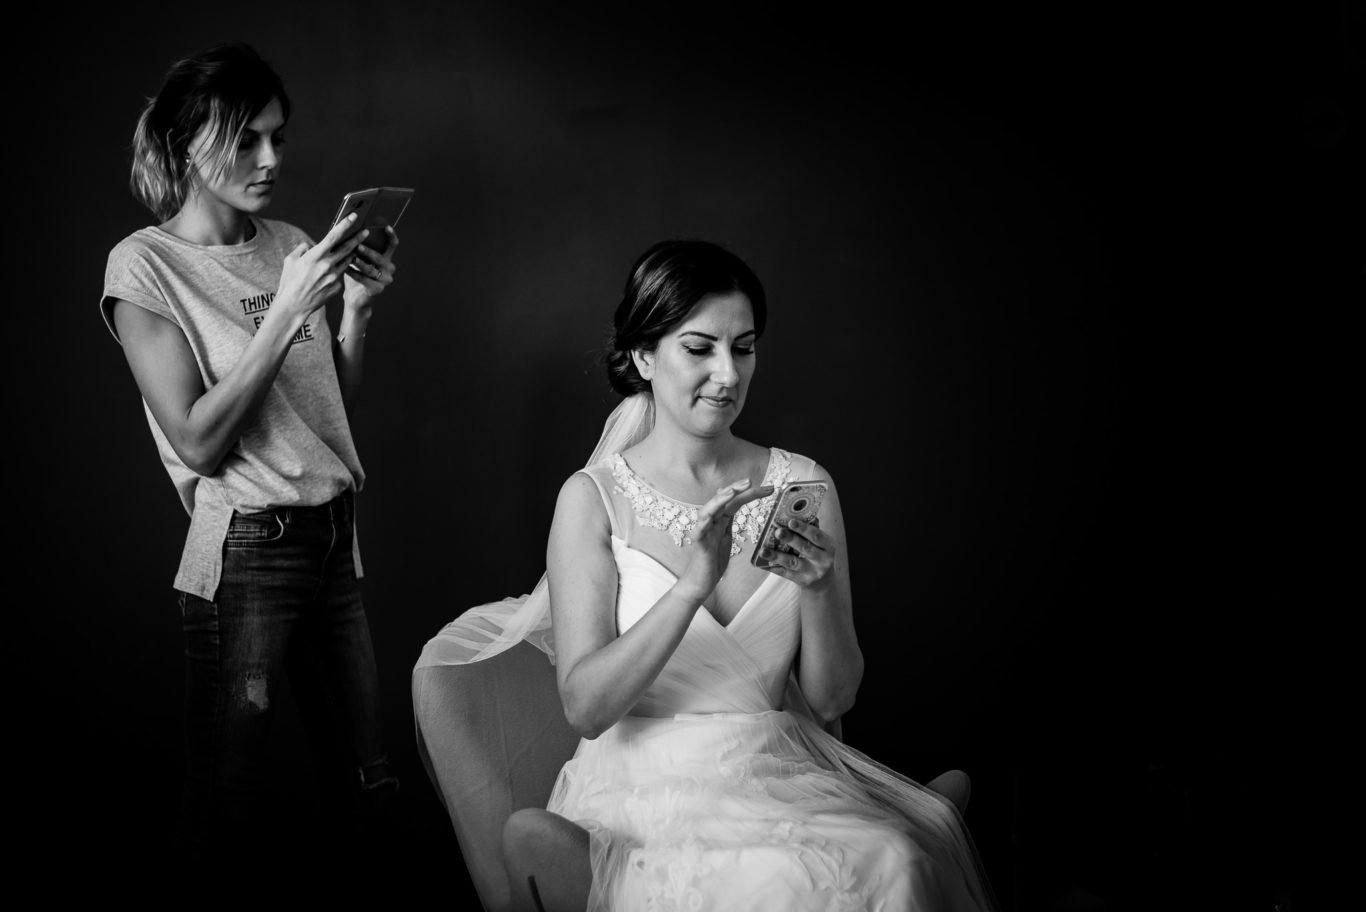 0119-Fotografie-nunta-Bucuresti-Oana-Catalin-fotograf-Ciprian-Dumitrescu-DSC_3660